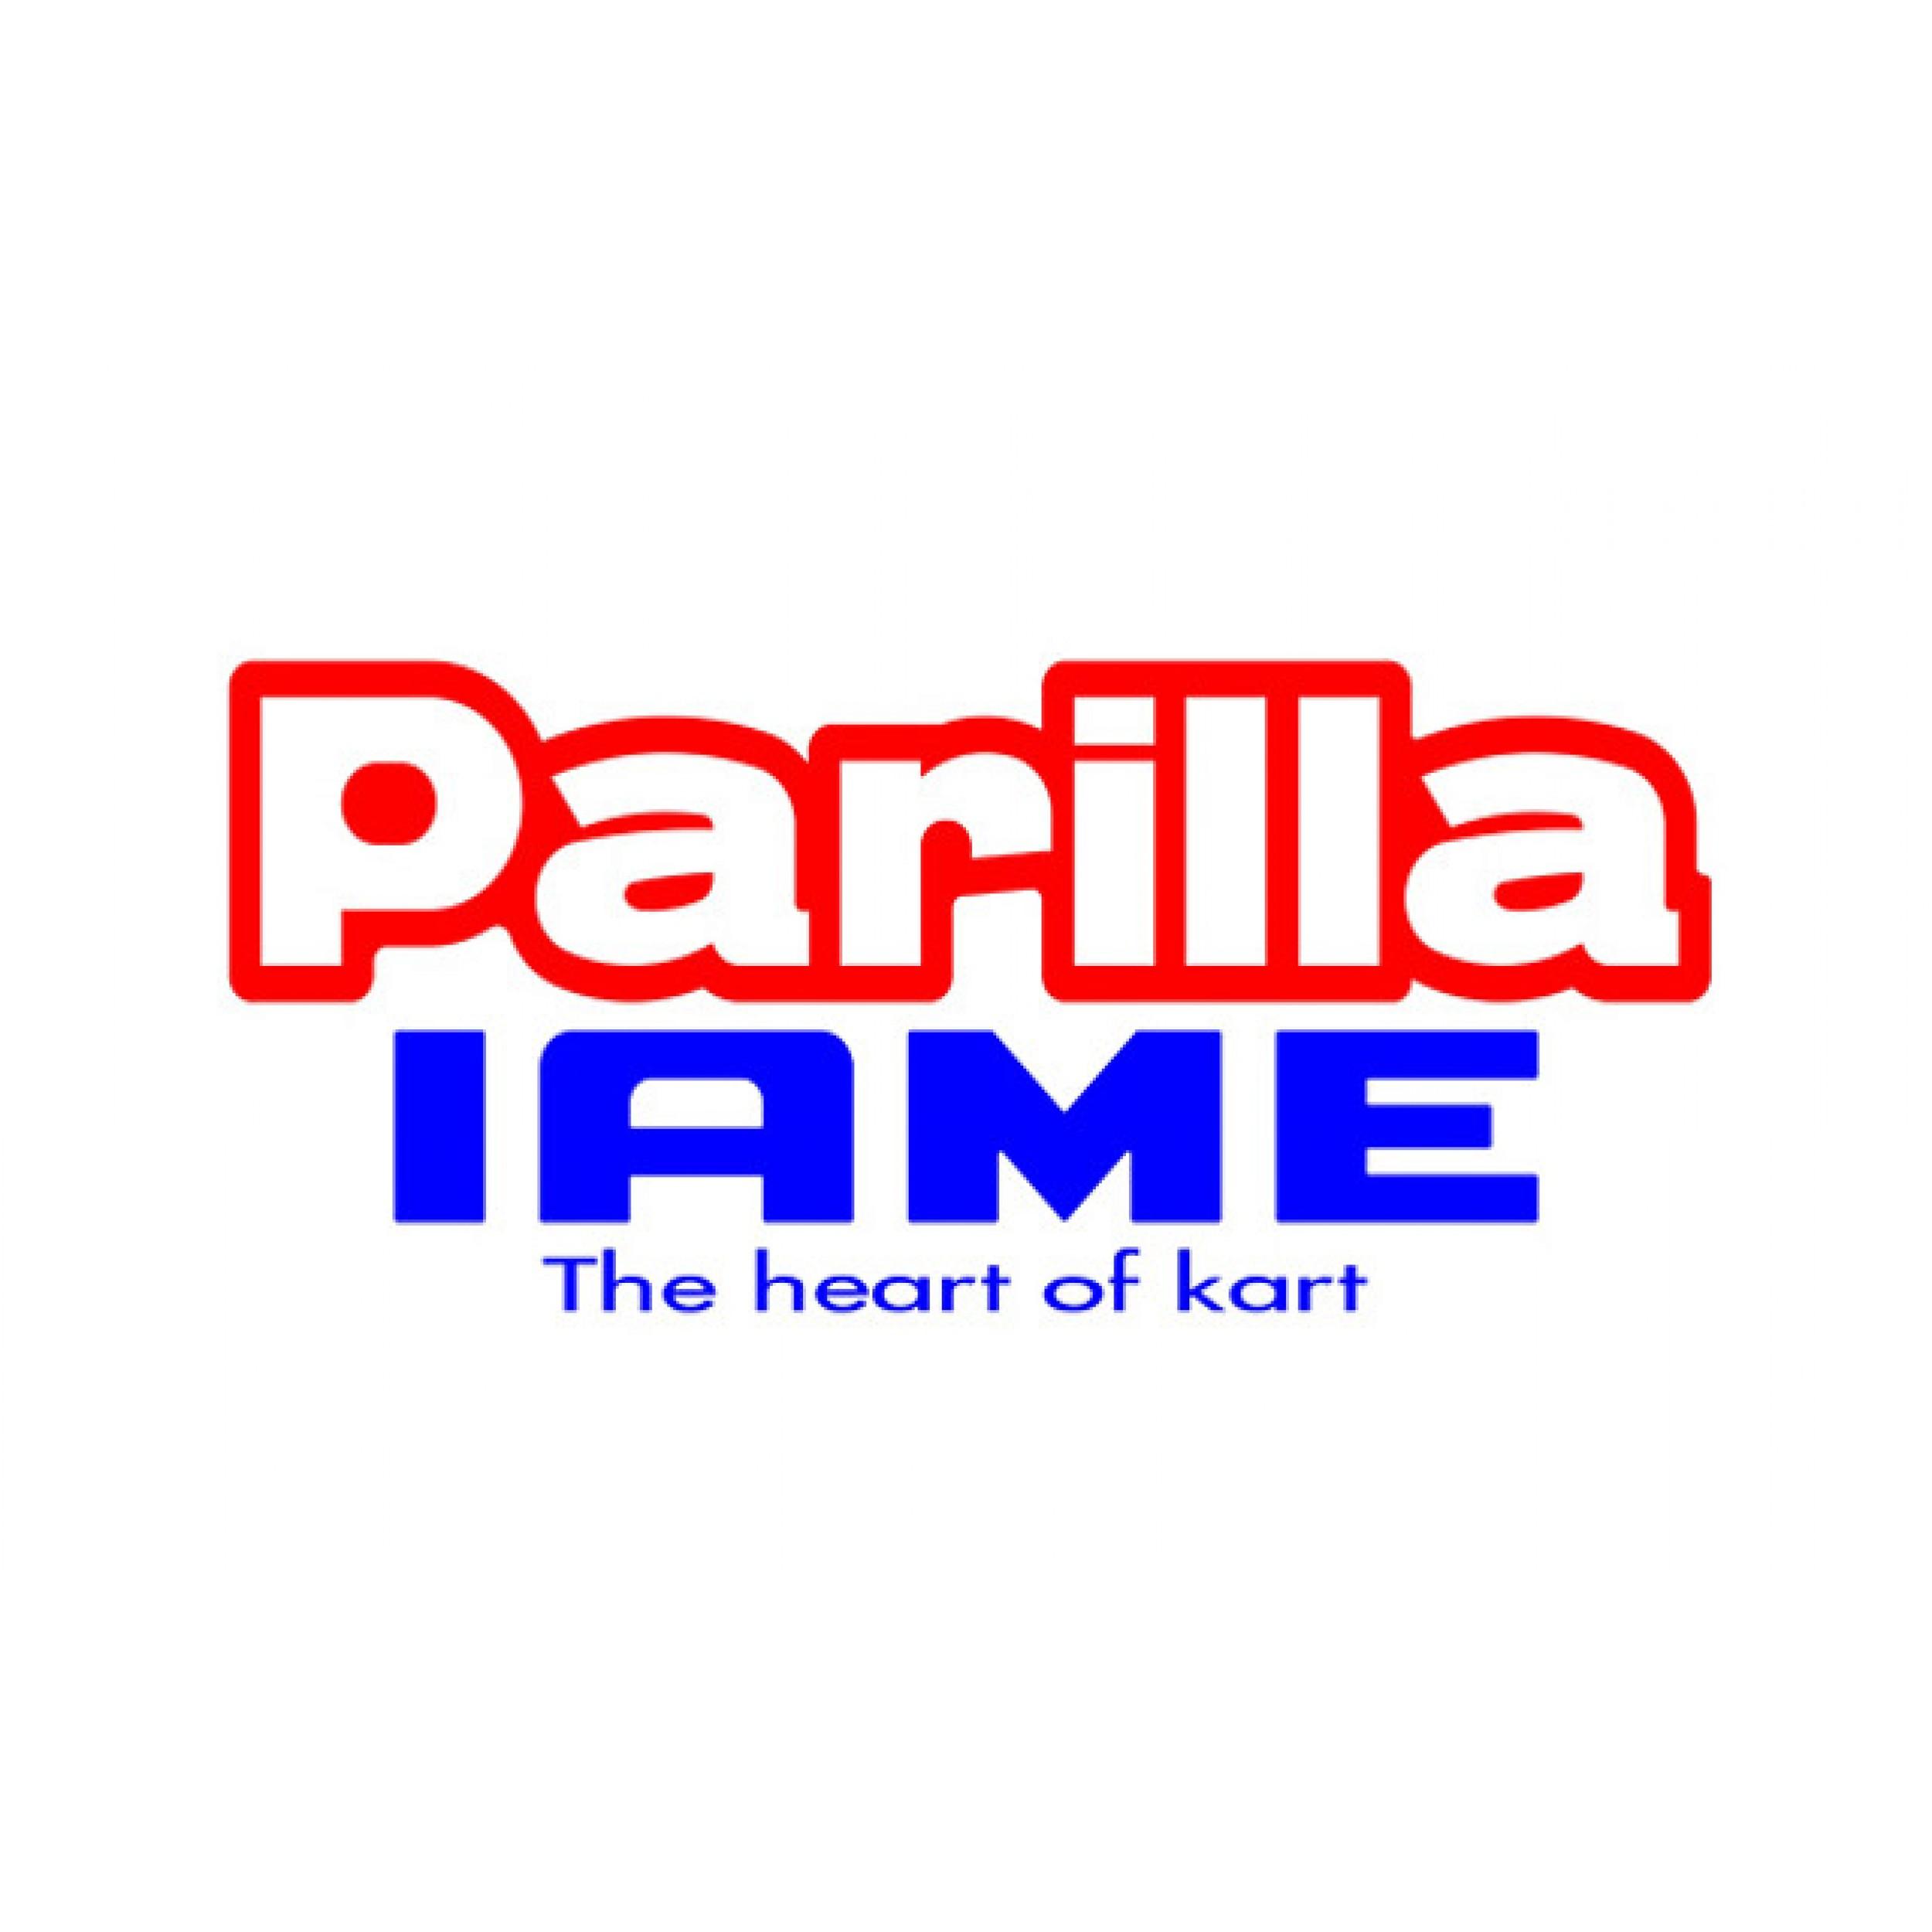 CATALOGS IAME PARILLA